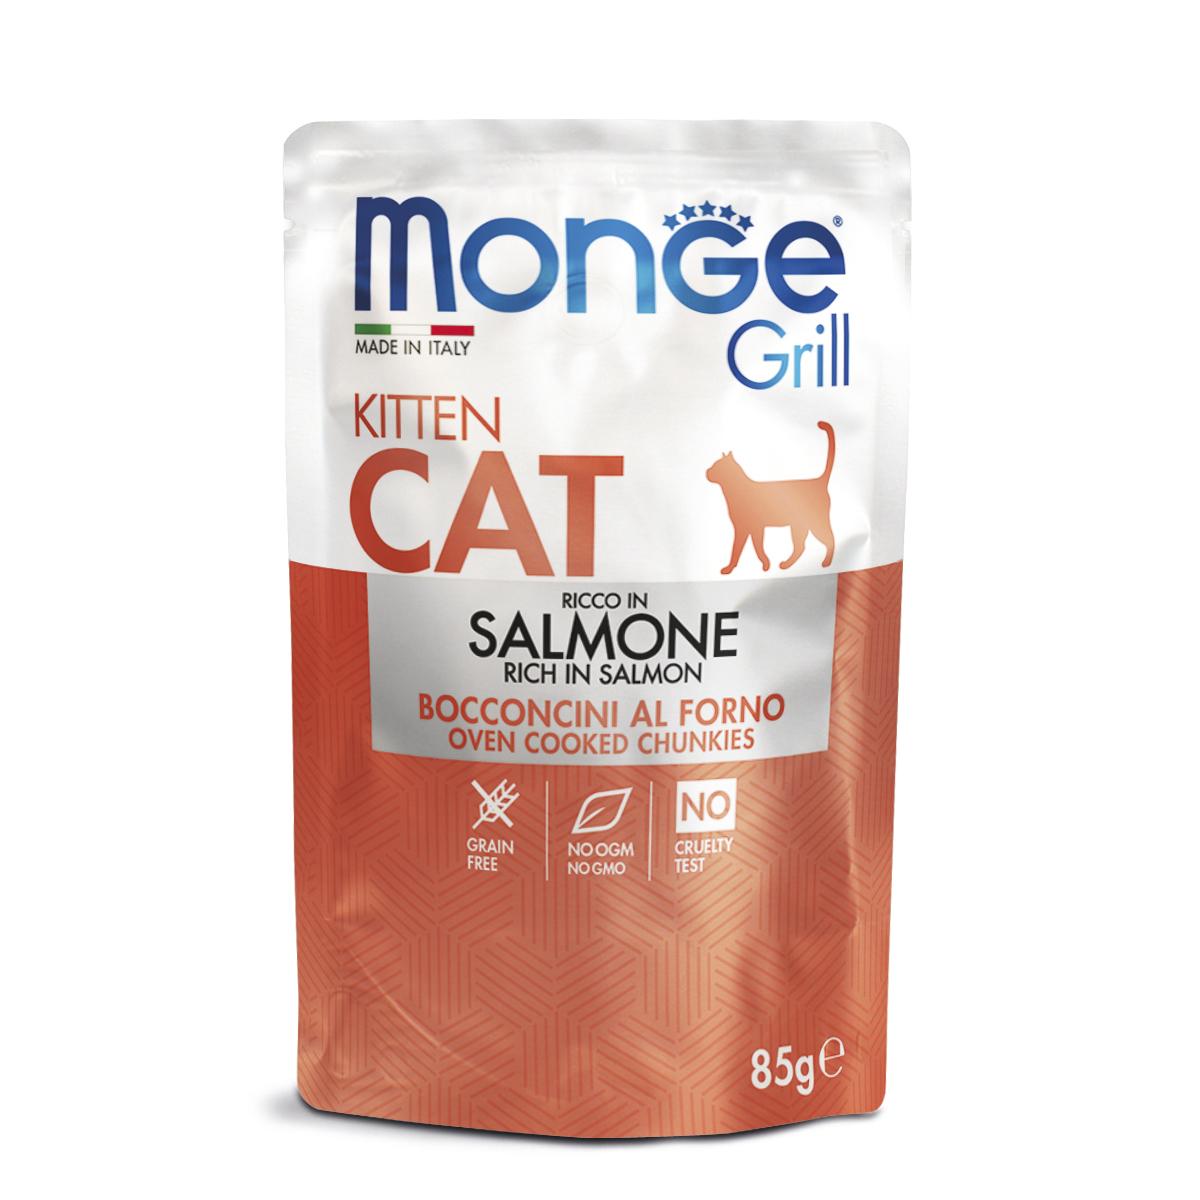 Влажный корм для котят Monge Grill Kitten, норвежский лосось, 85 г